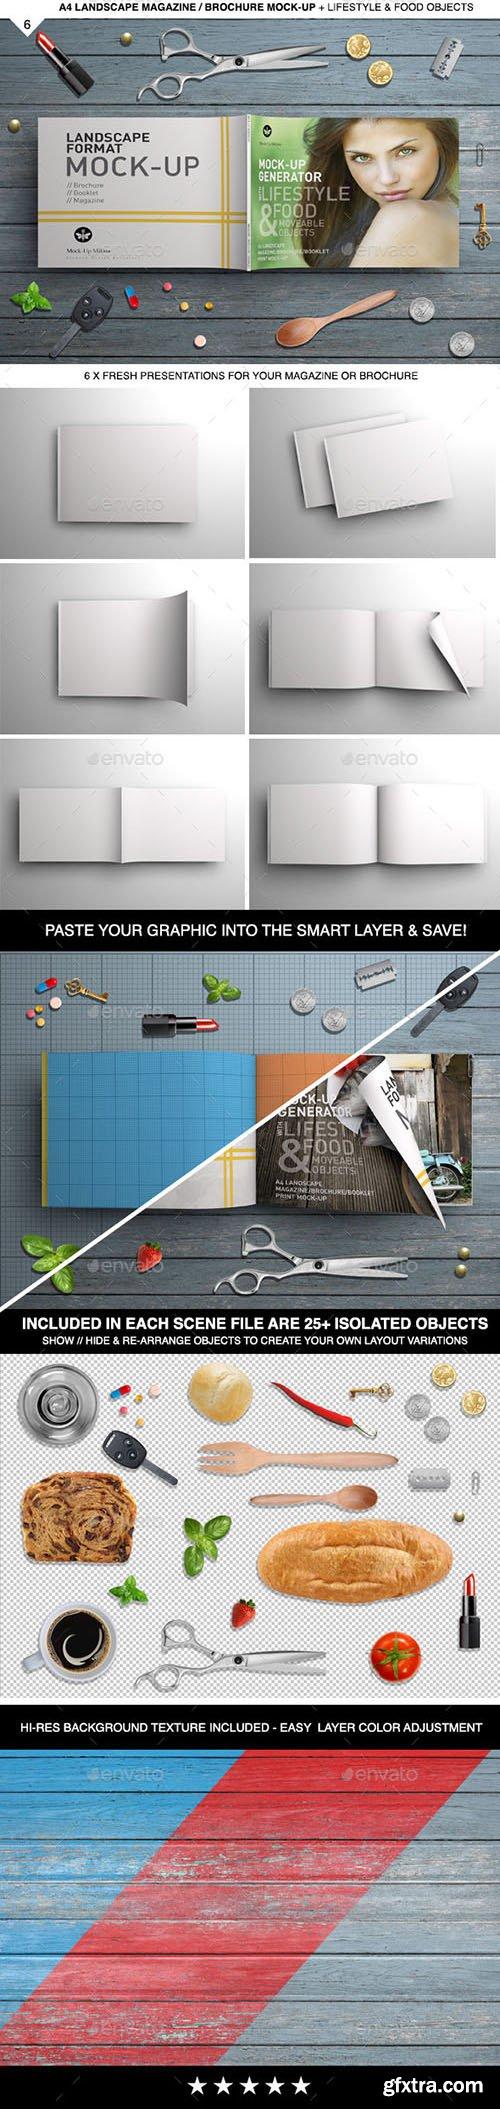 GraphicRiver: A4 Landscape - Magazine Mock-Up & Scene Generator 10945853